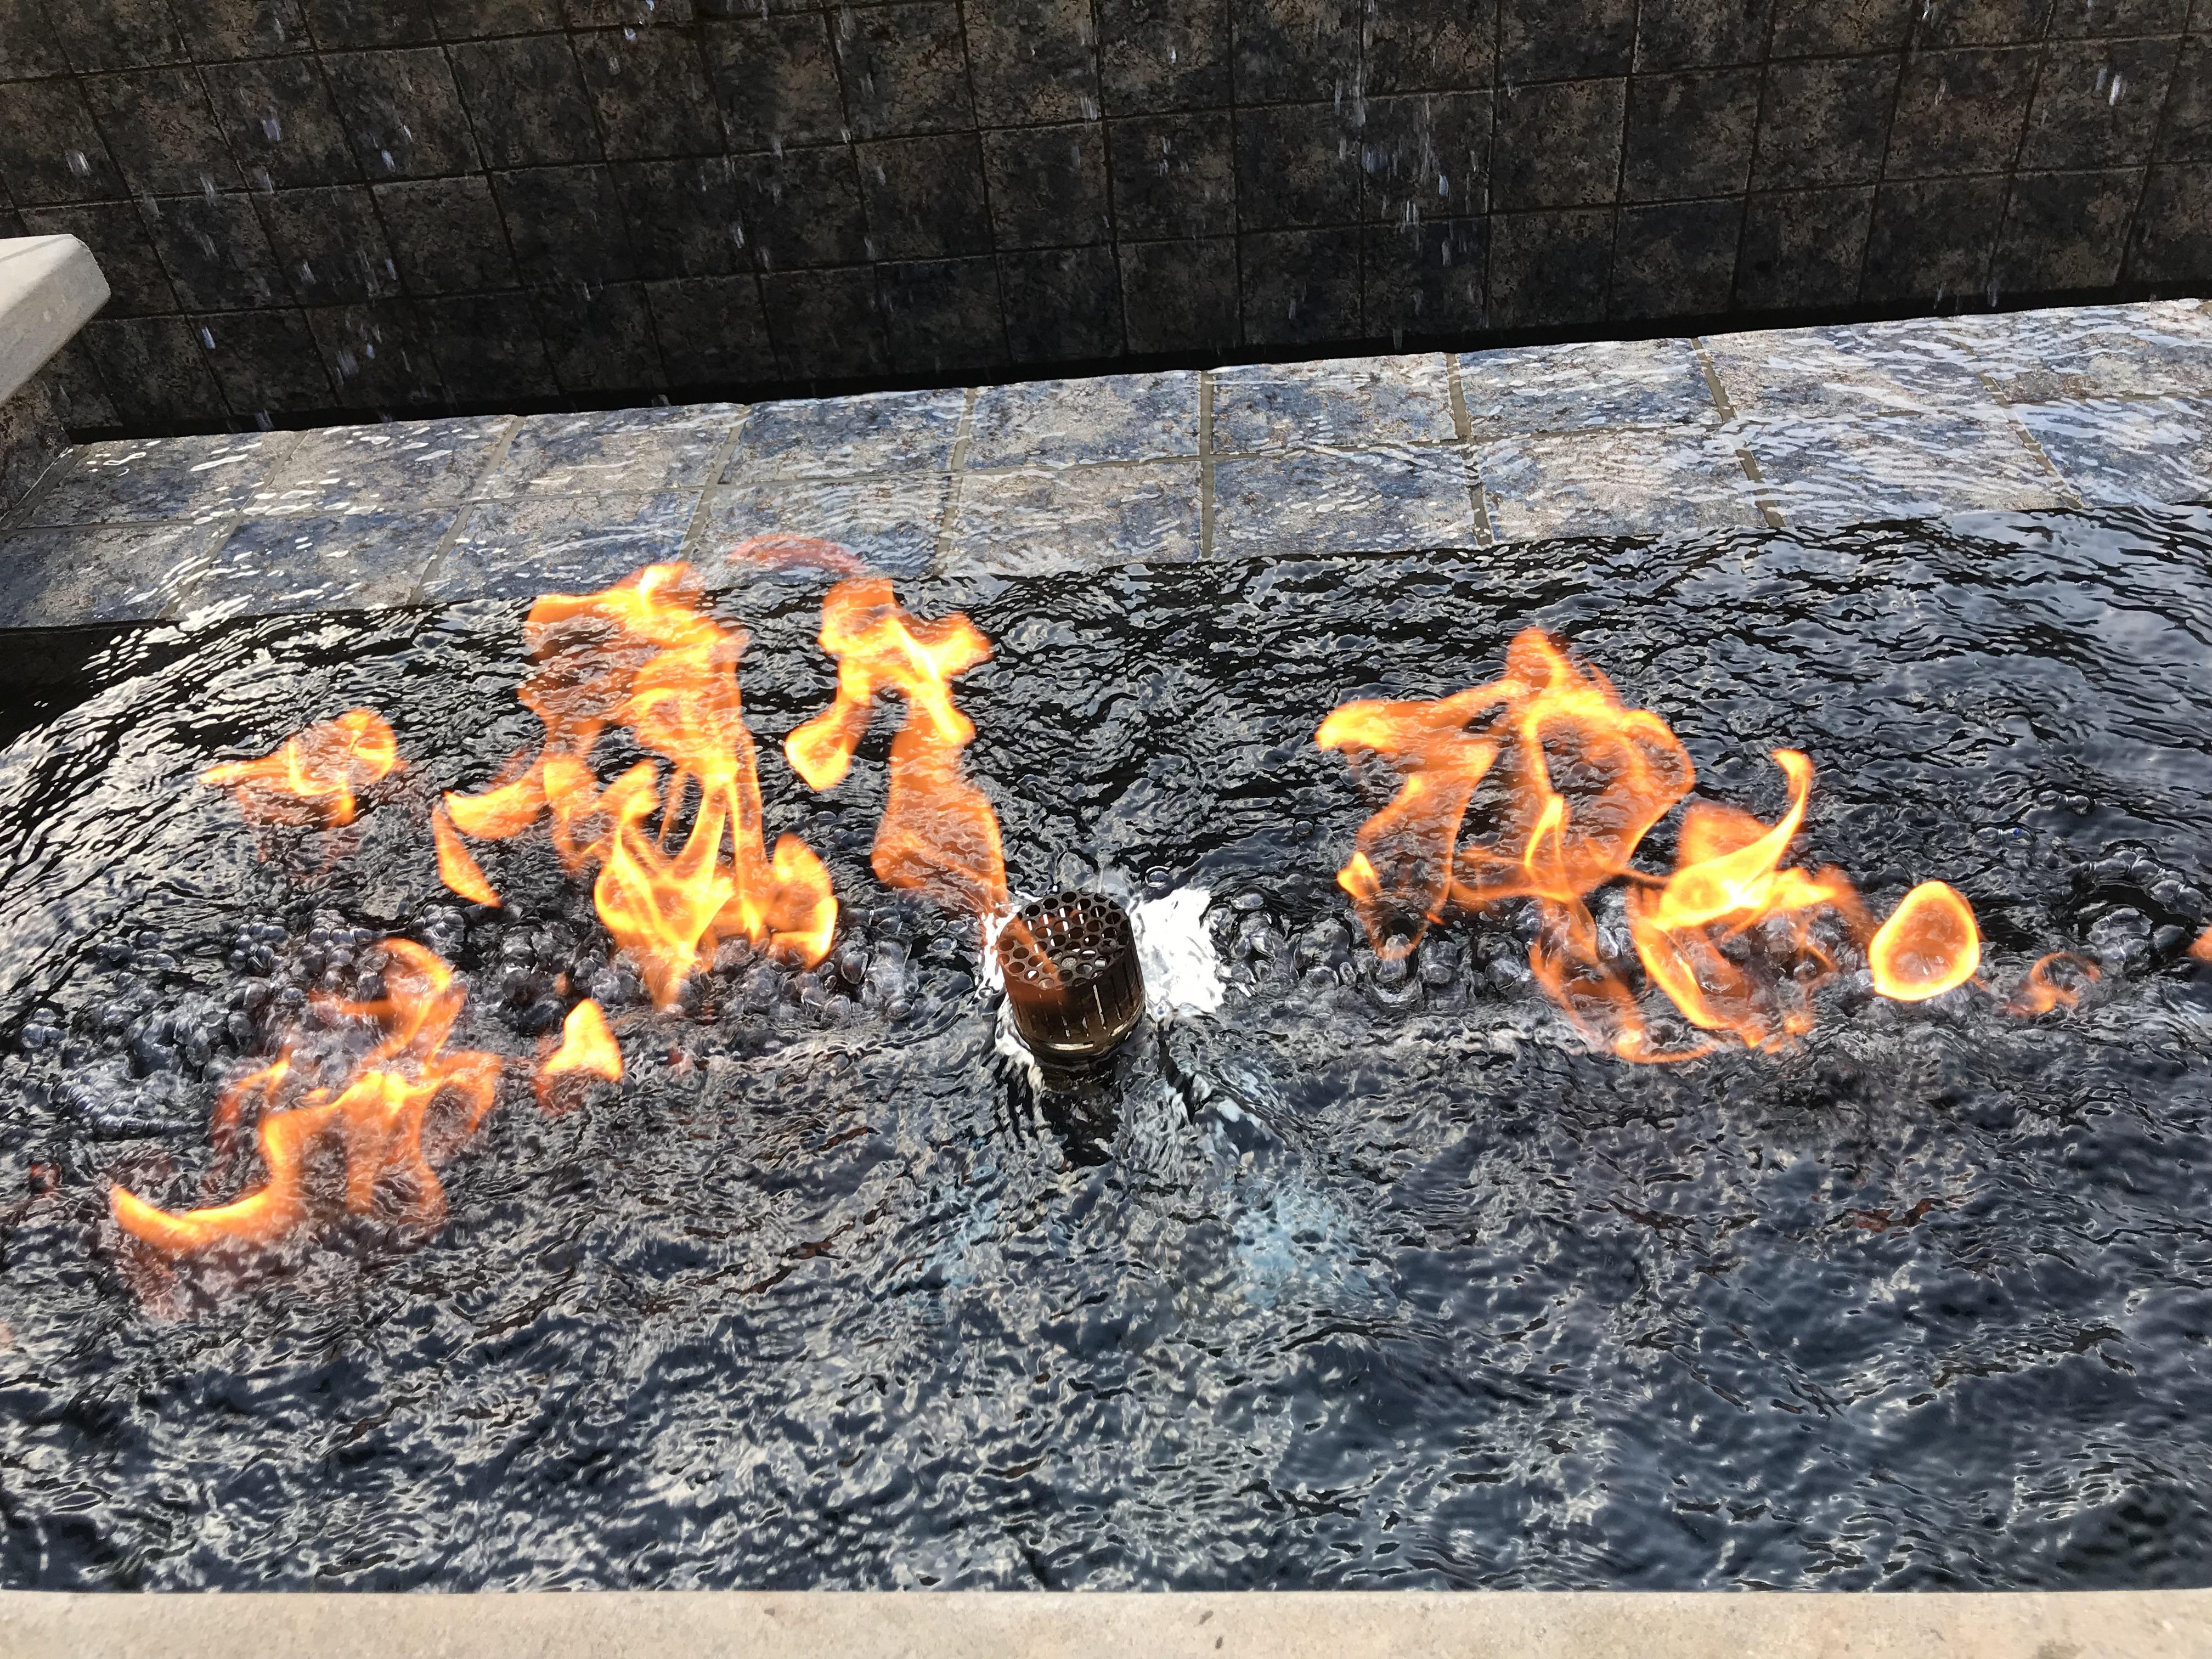 <div class='meta'><div class='origin-logo' data-origin='none'></div><span class='caption-text' data-credit='WTVD Photo/Shawn Replogle'>Fire in the pool - 5105 Avalaire Oaks Drive, Raleigh, NC - $3.2 million by Bost Custom Homes</span></div>